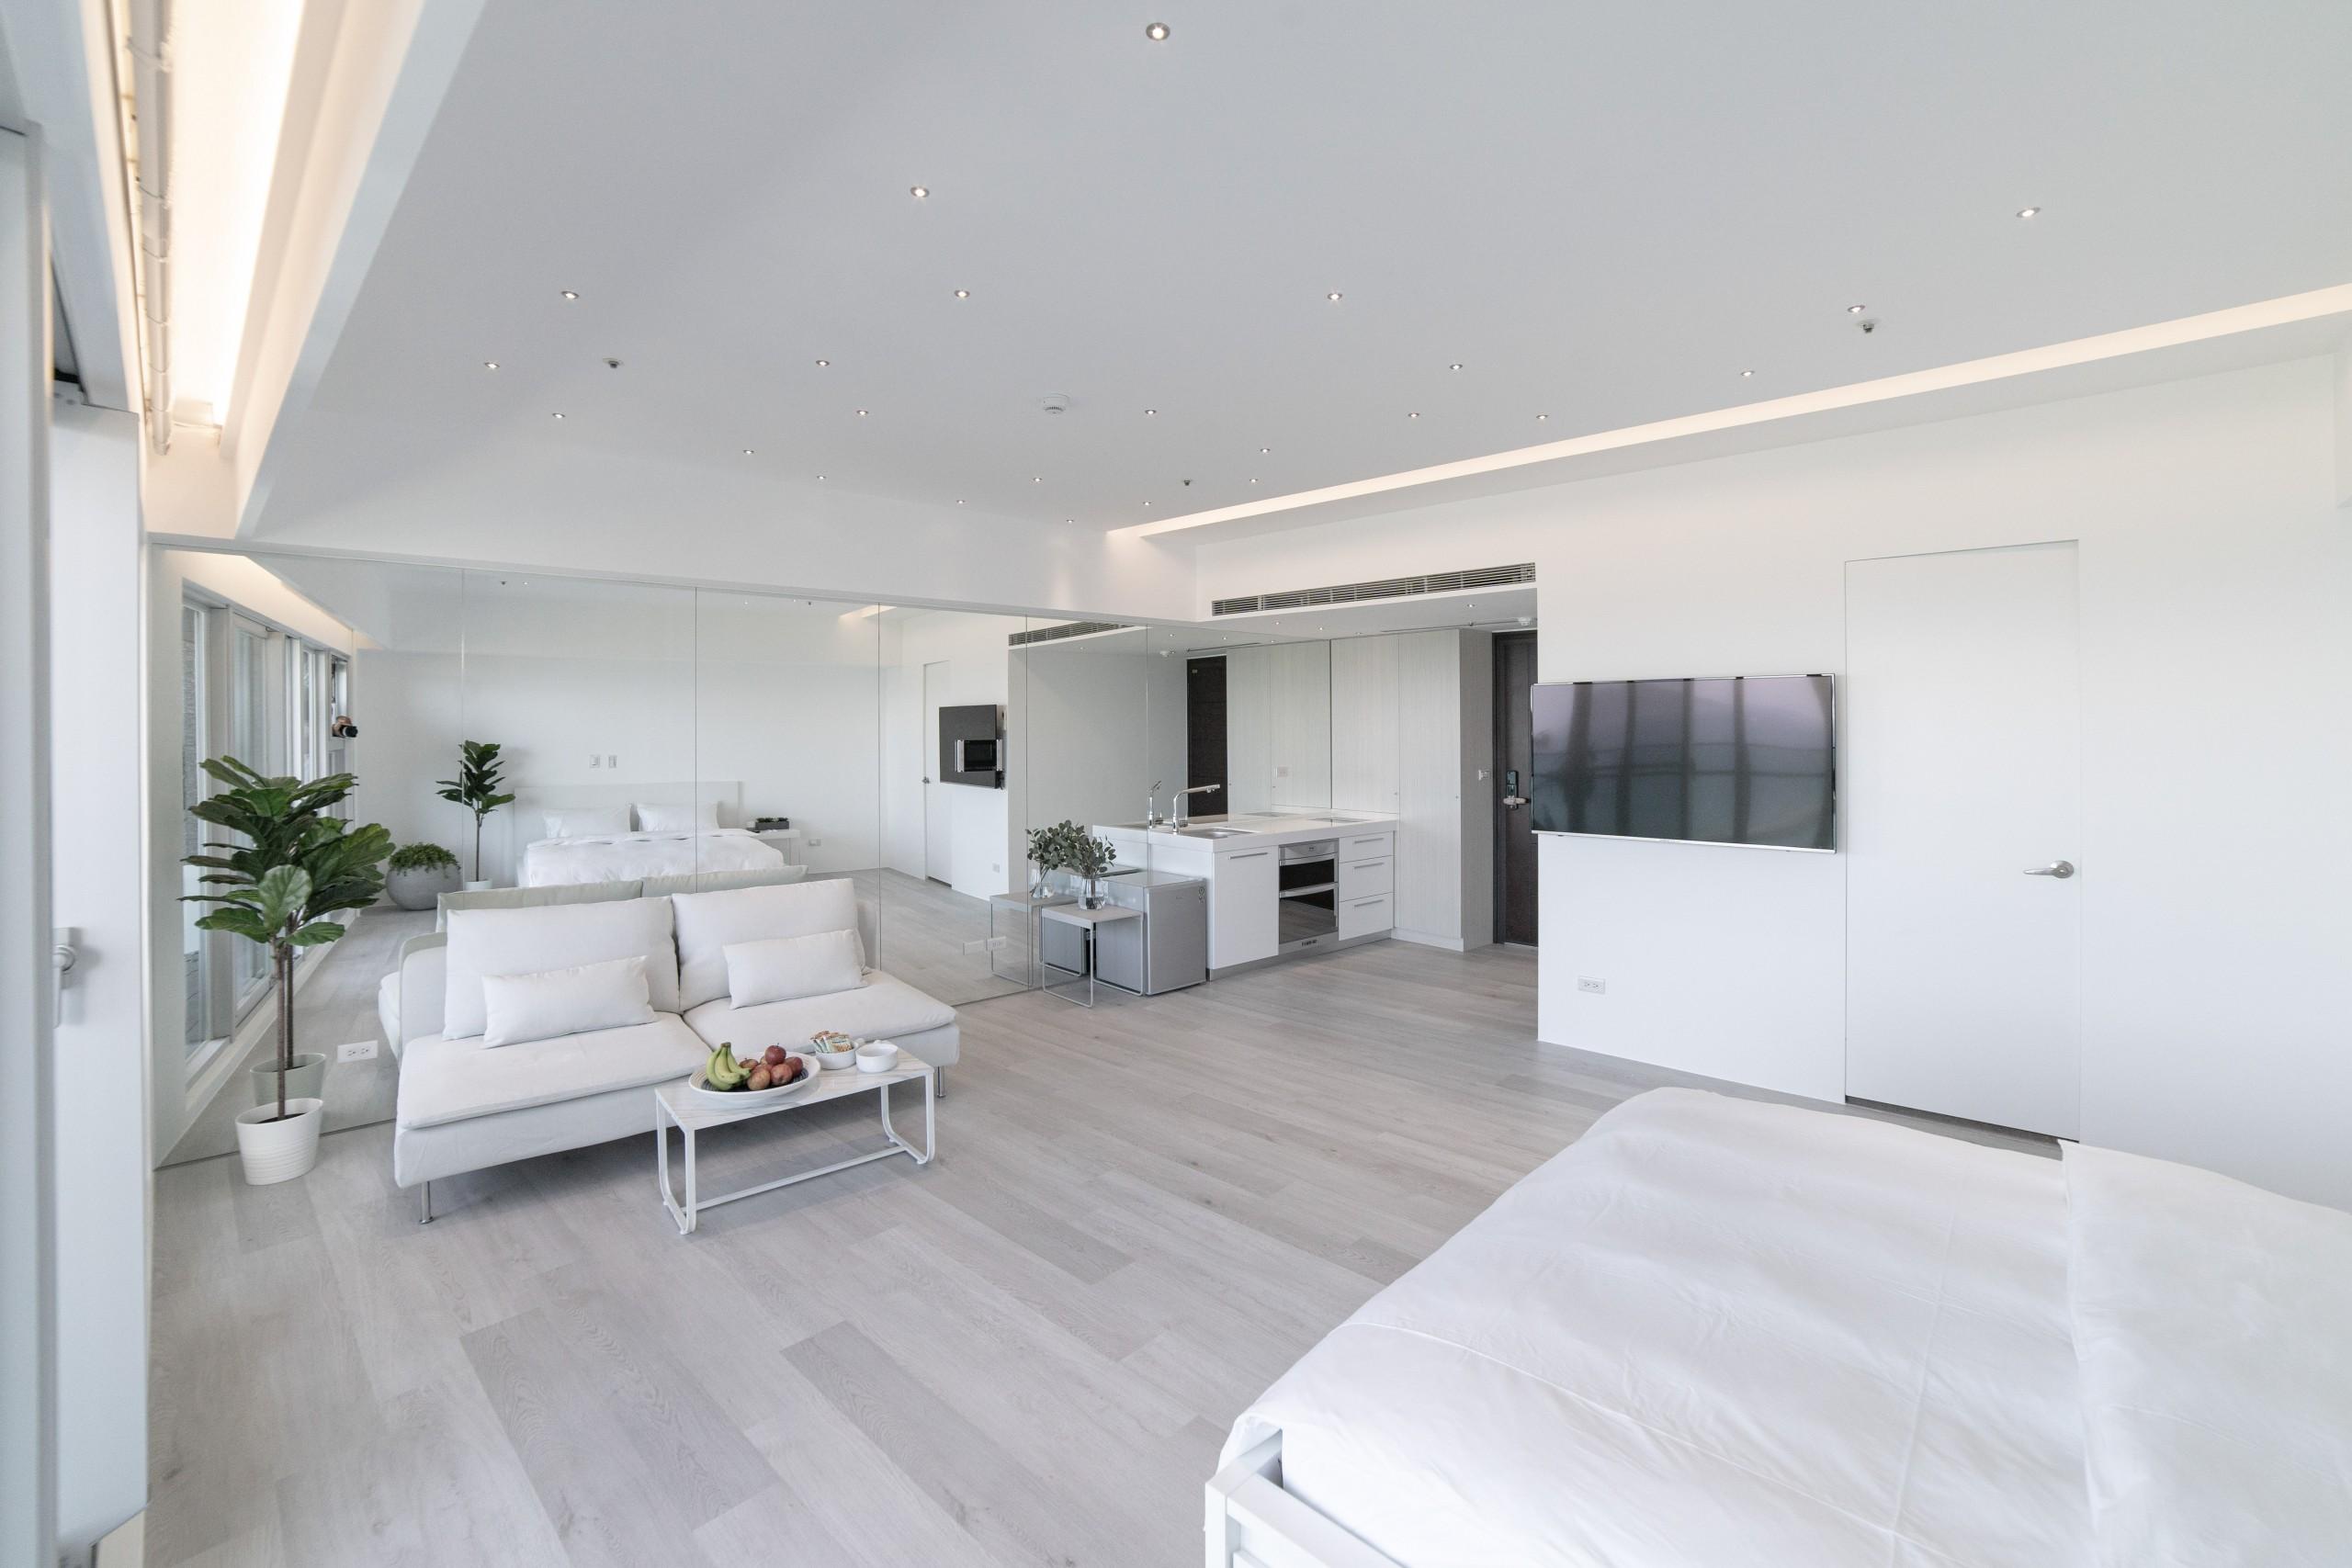 德築-DEZU-project-世界灣自宅裝修-architecture-interior-5